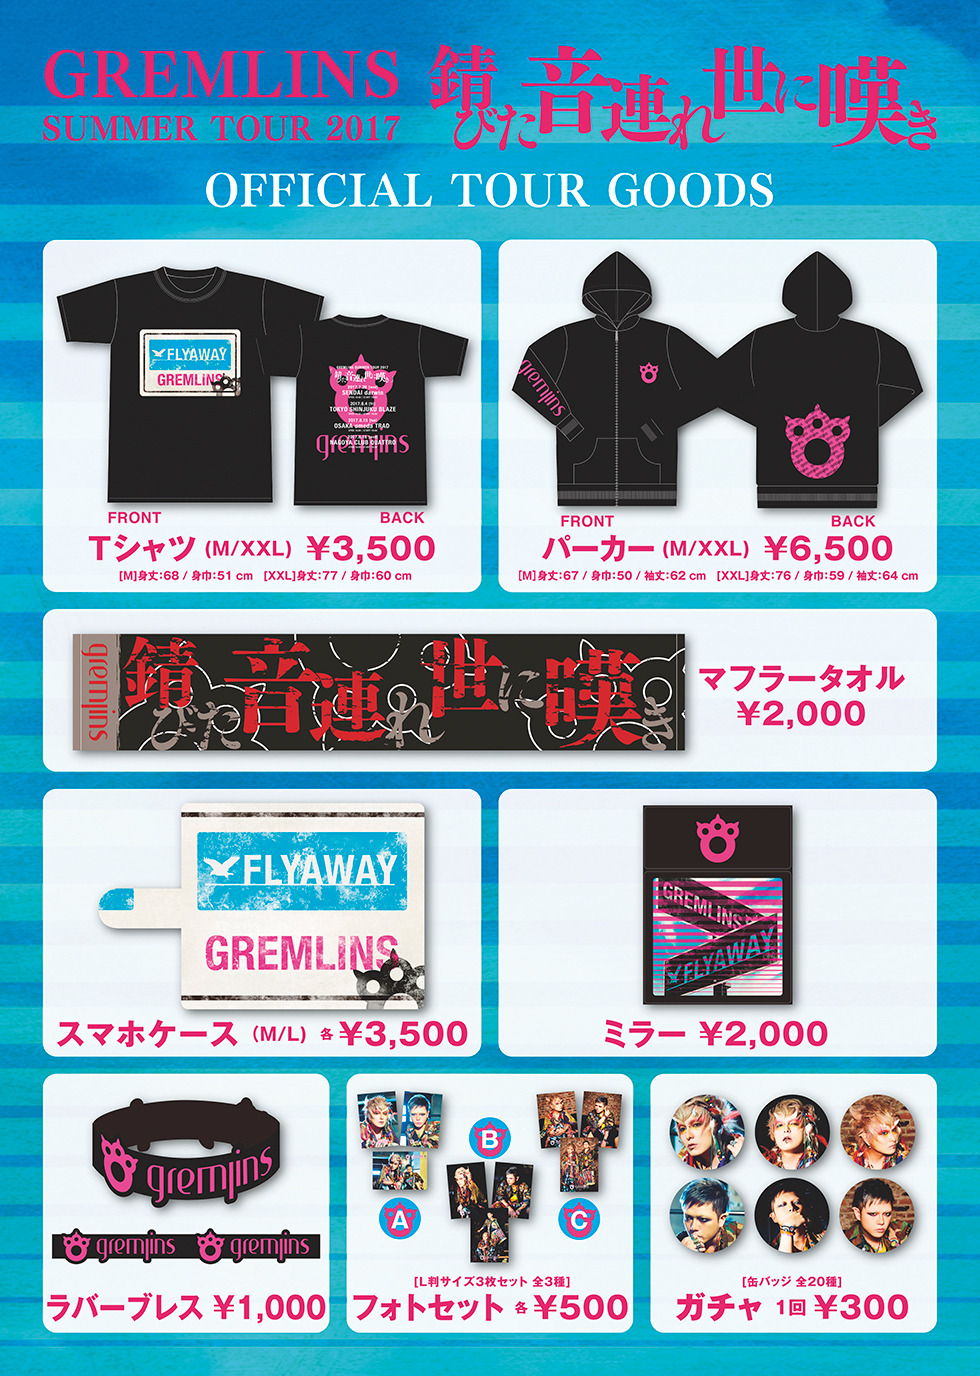 http://hitsuuu.me/GR_201707_dabitaototsure_yoninageki_goods.jpg